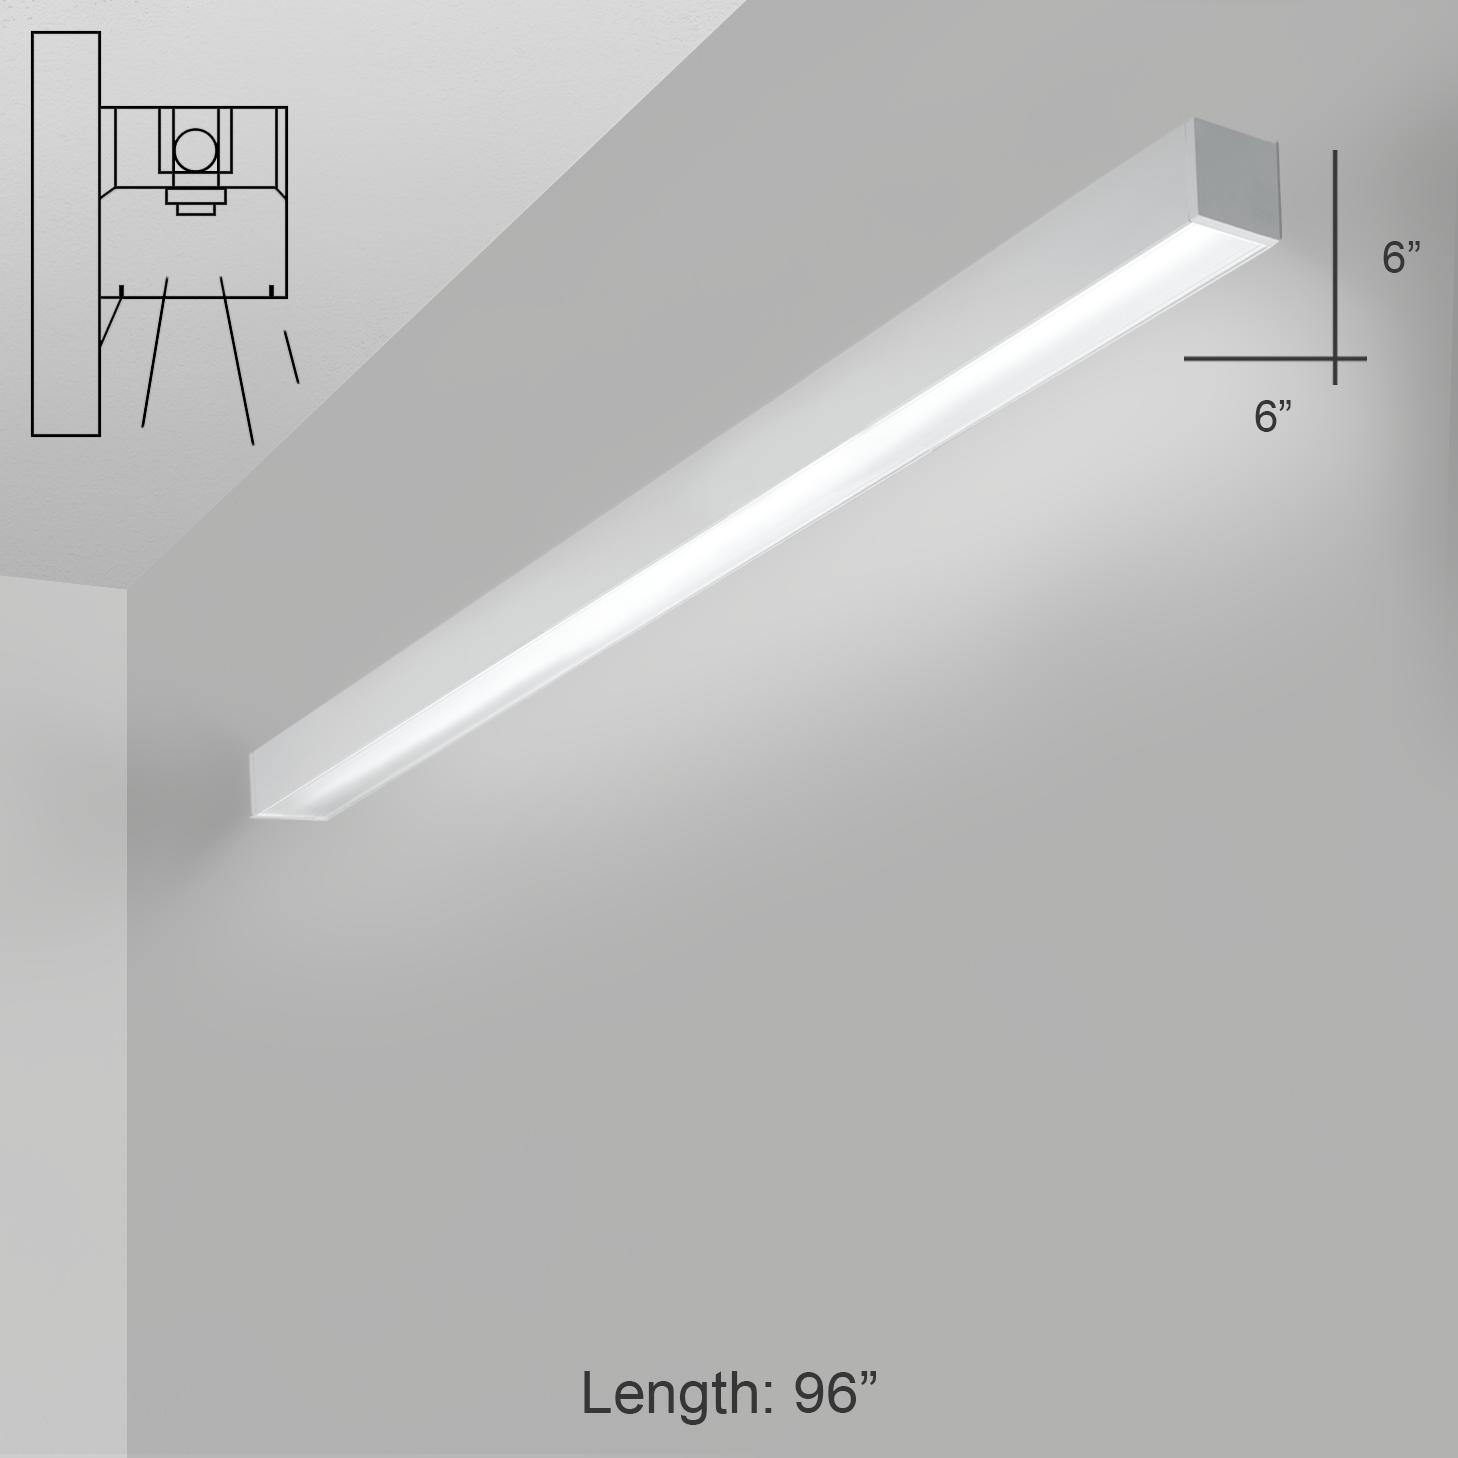 Alcon Lighting 12200 6 W 8 Rft Series